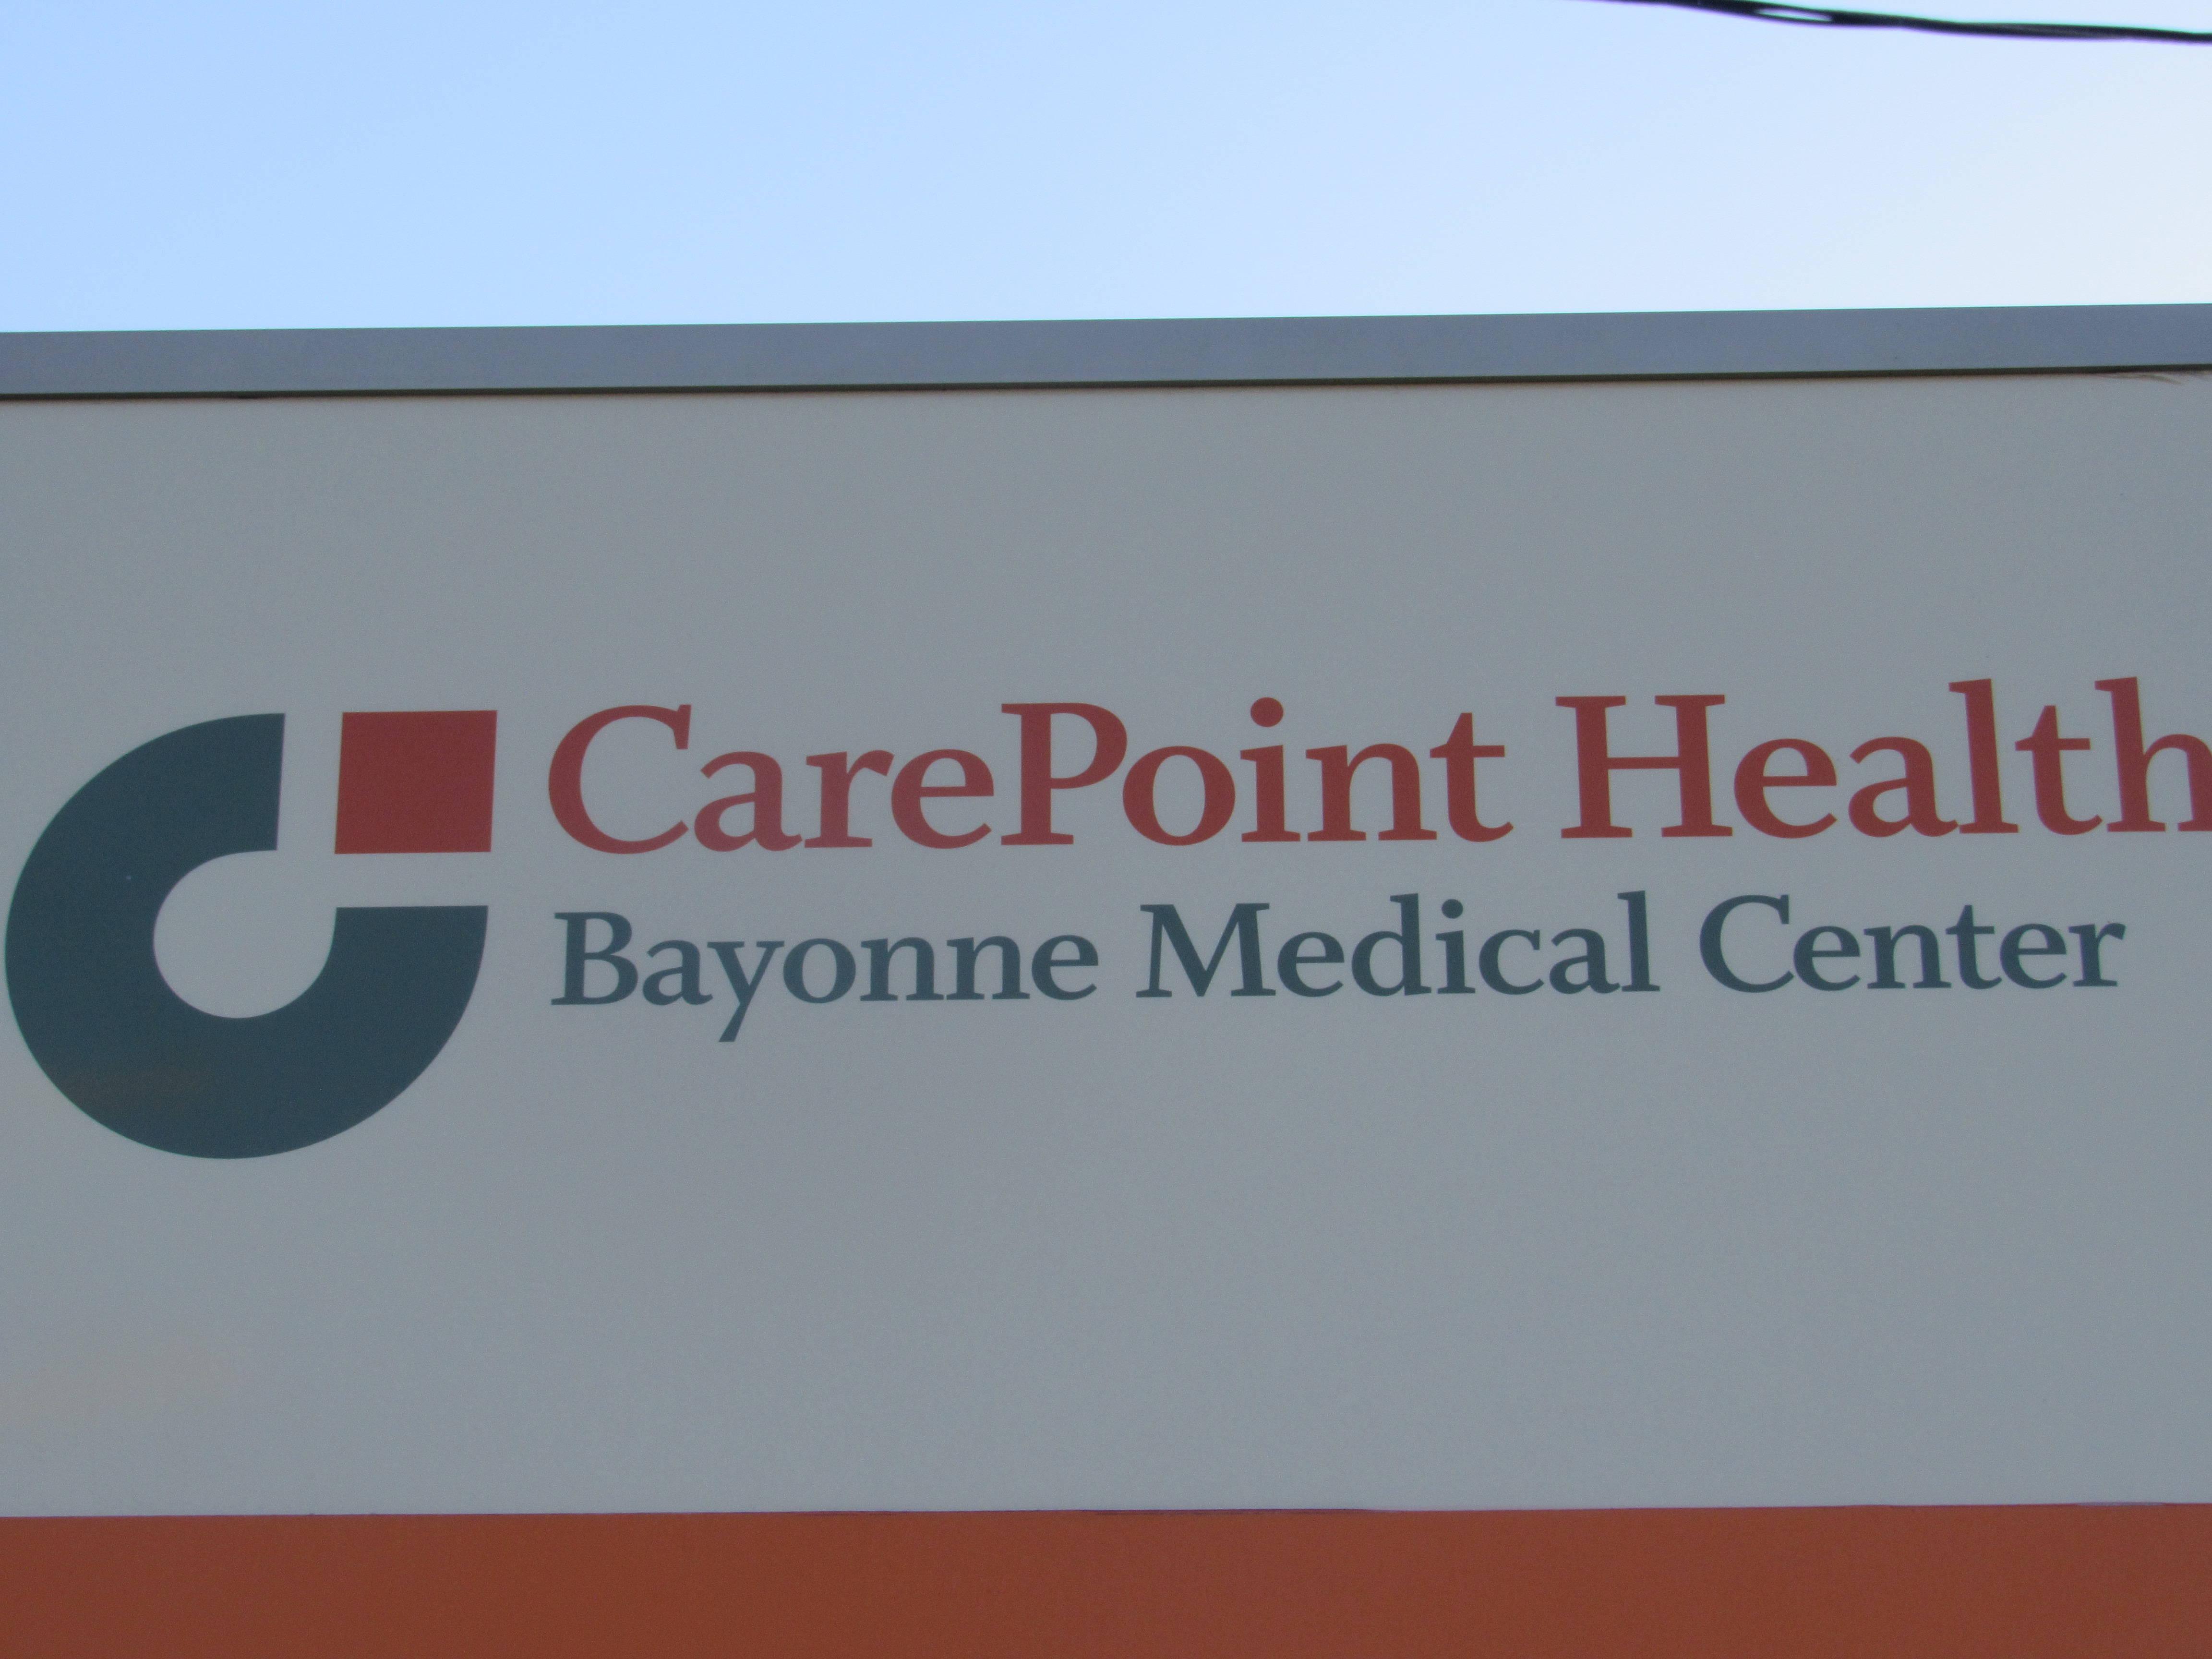 Bayonne Medical Center